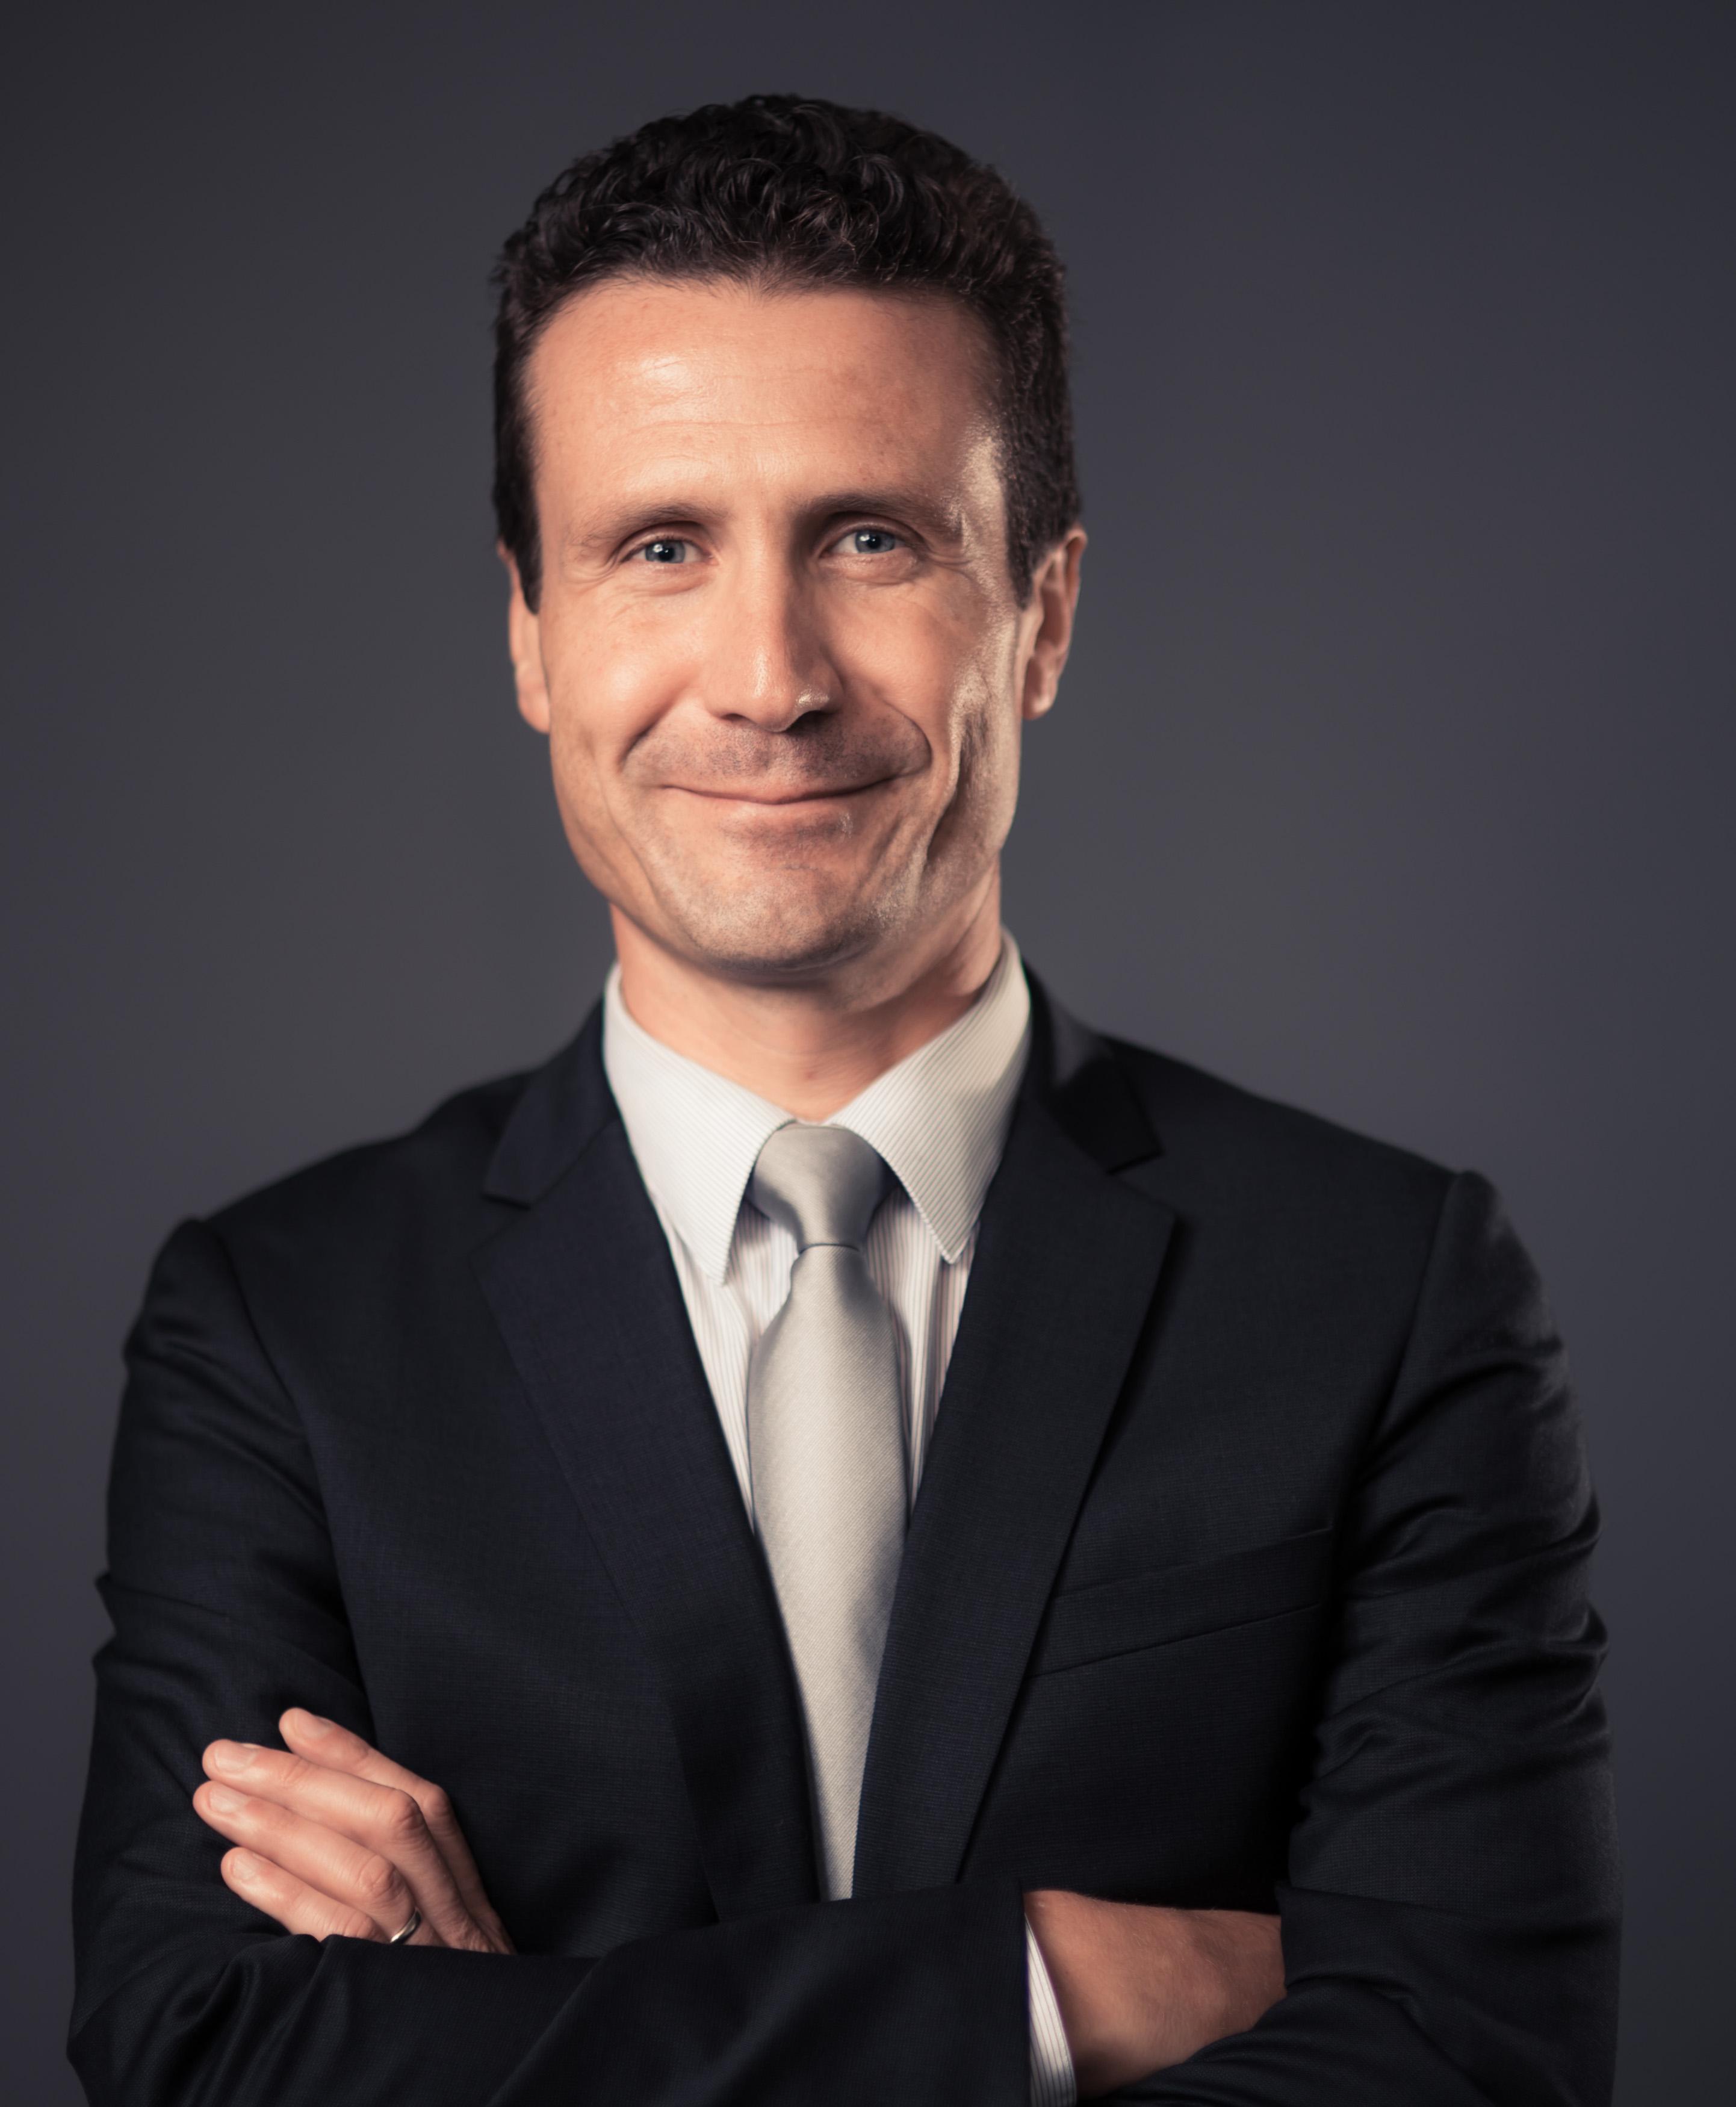 David Cochet - Swiss Risk & Care